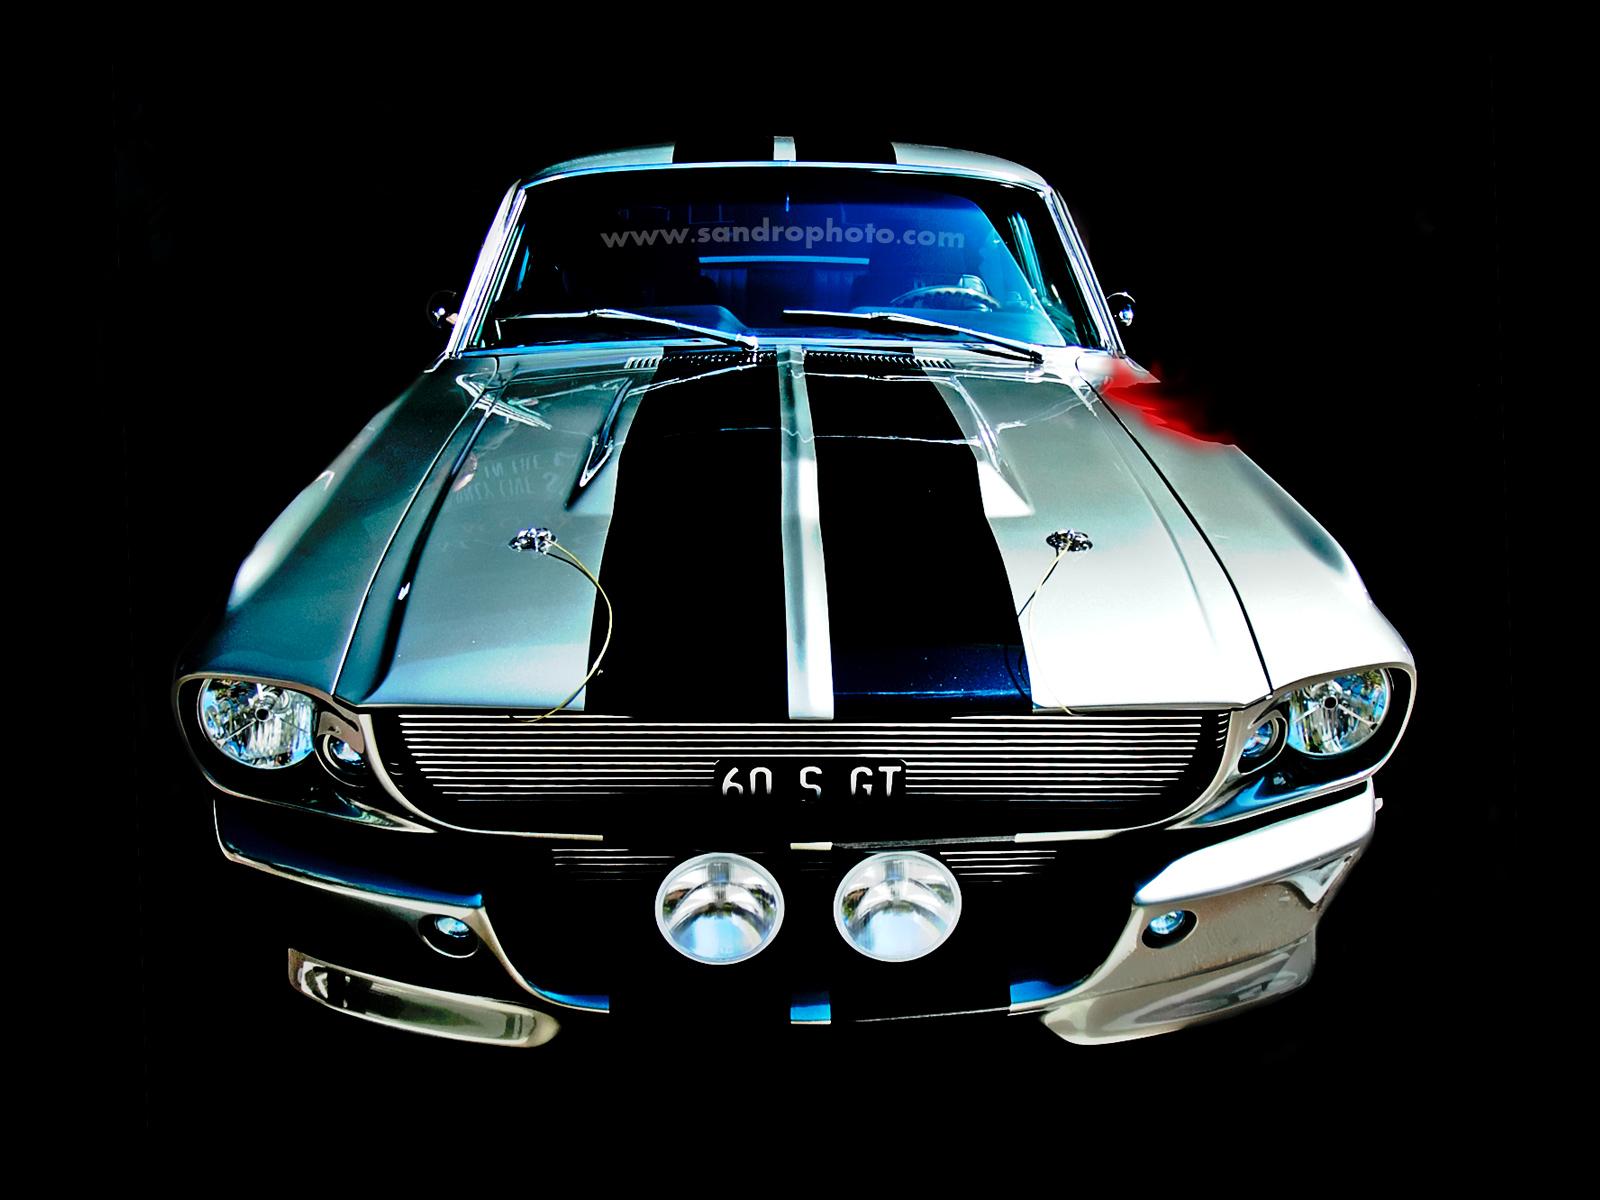 hd muscle car wallpapers hd muscle car wallpapers hd muscle car 1600x1200